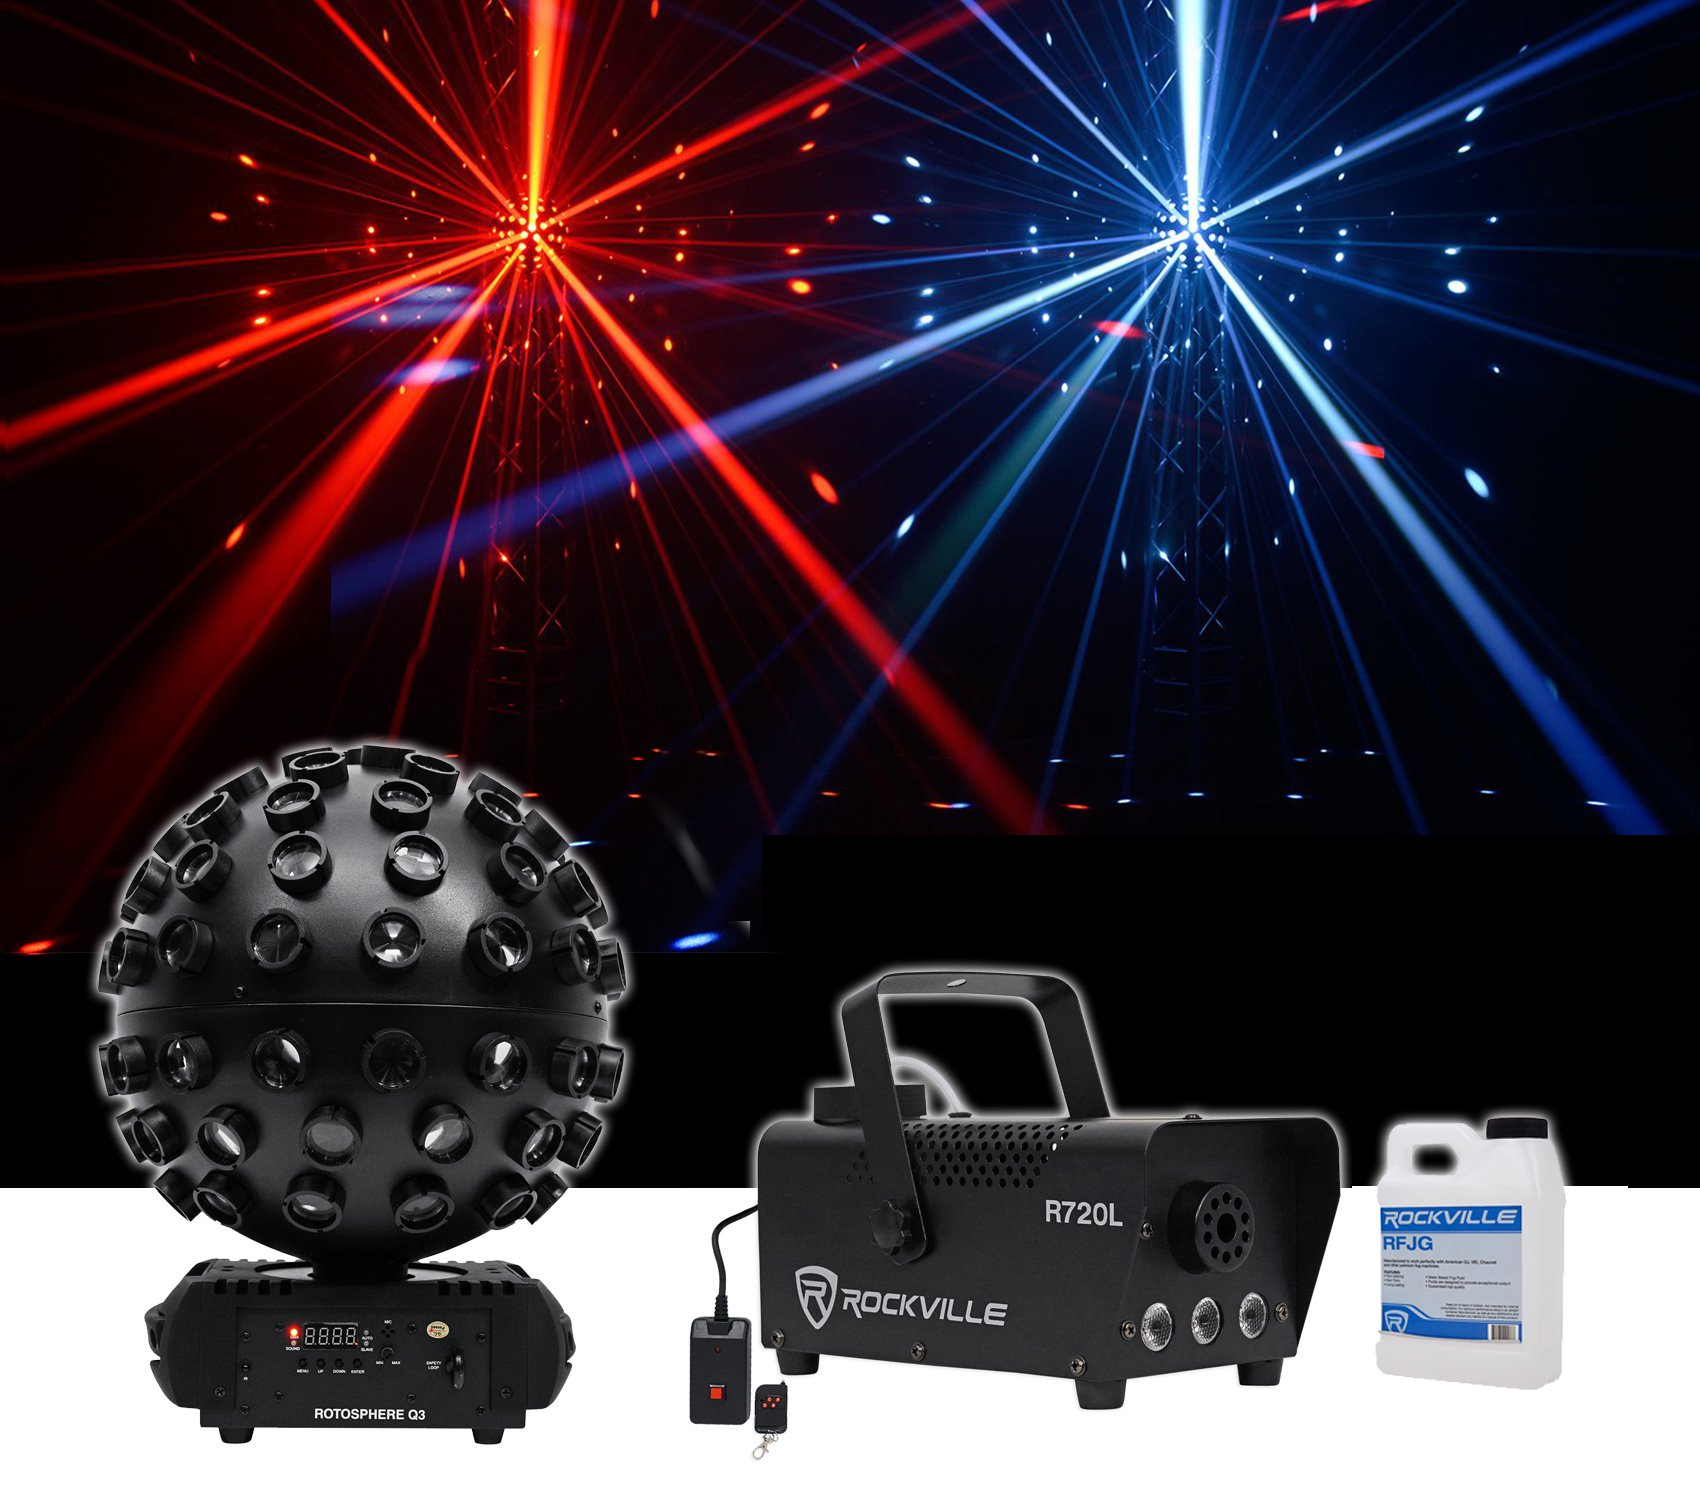 Chauvet DJ Rotosphere Q3 Mirror Ball Dance Floor LED Effect Light + Fog Machine by Chauvet